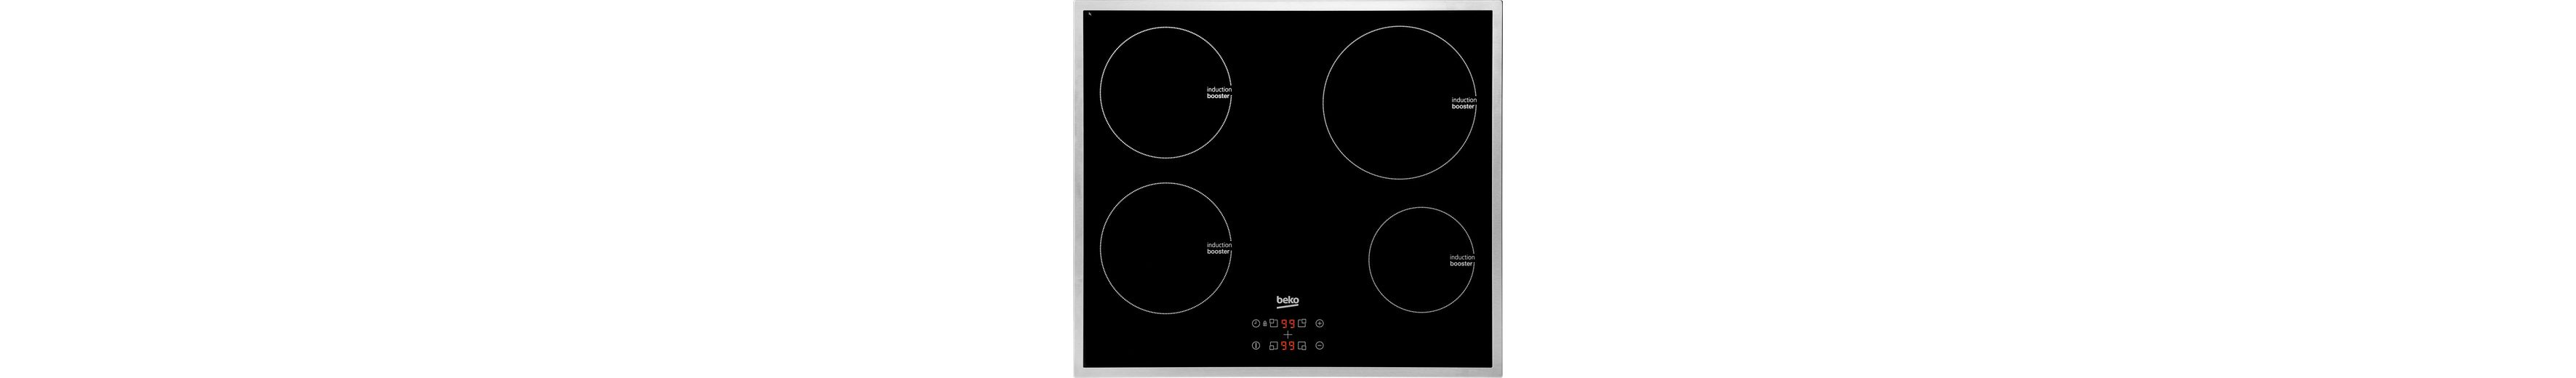 Beko Induktions-Kochfeld »HII 64400 ATX«